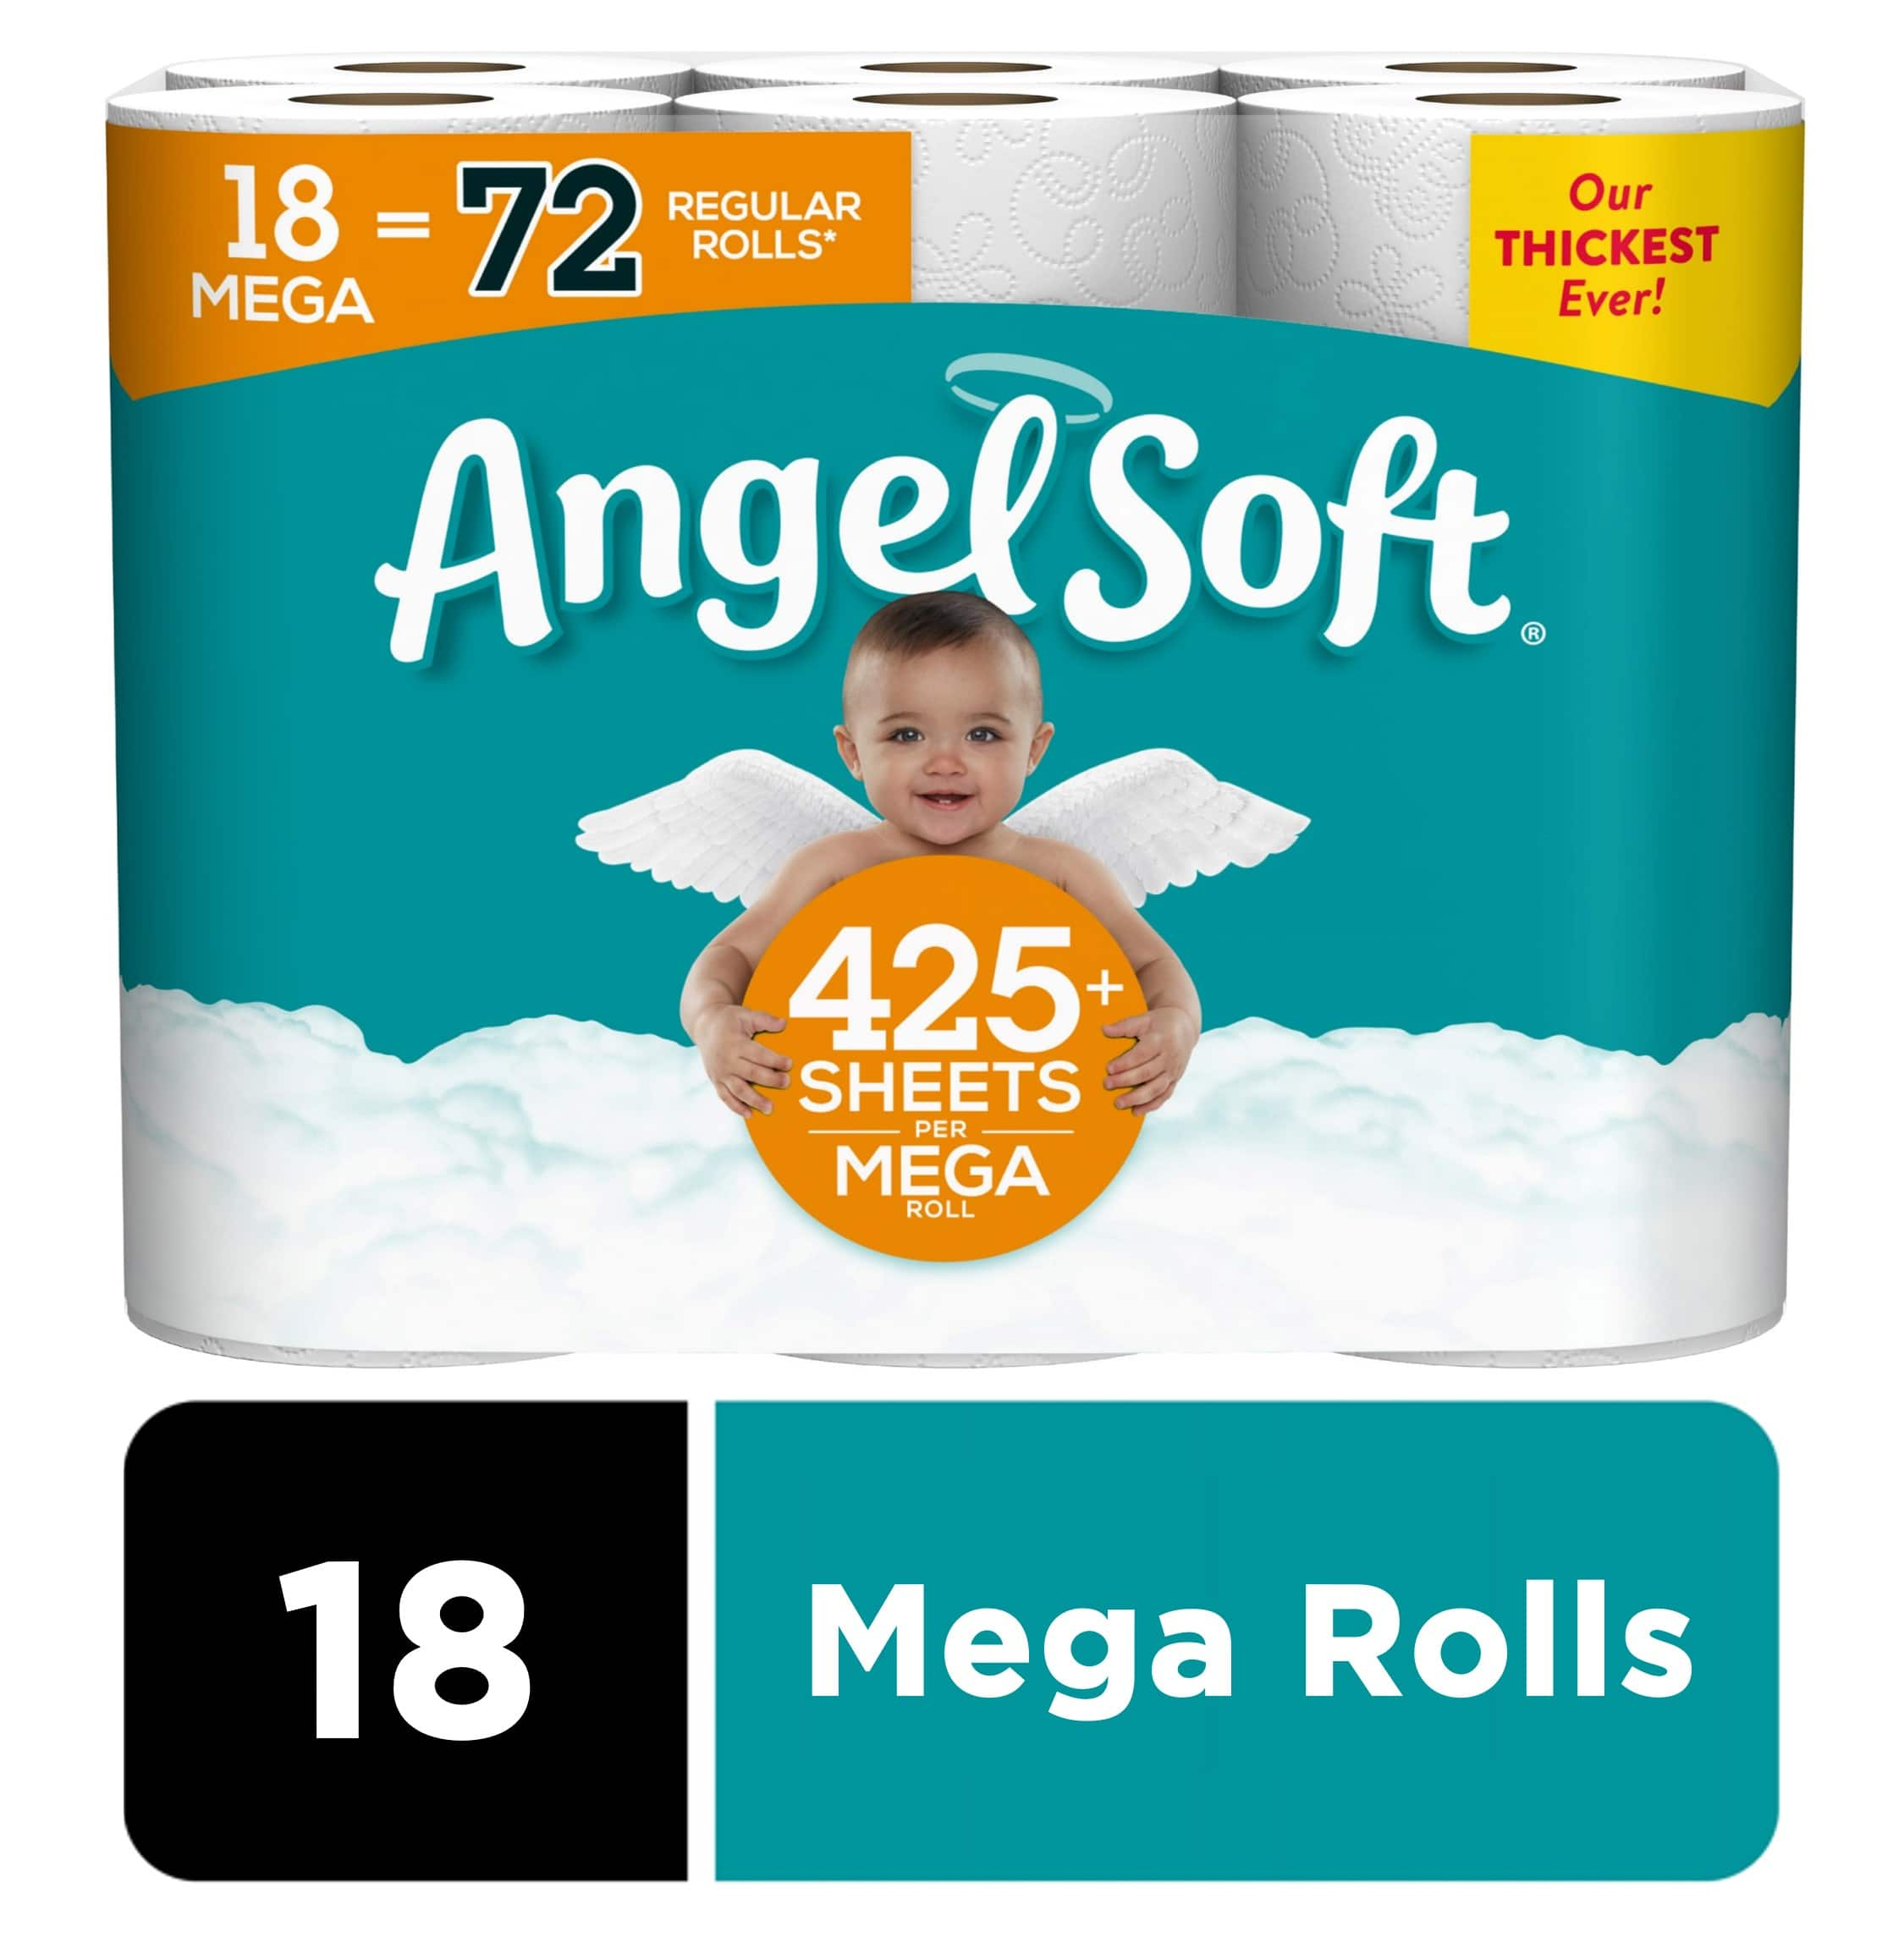 Angel Soft Toilet Paper, 18 Mega Rolls (= 72 Regular Rolls) limit 3 $14.97